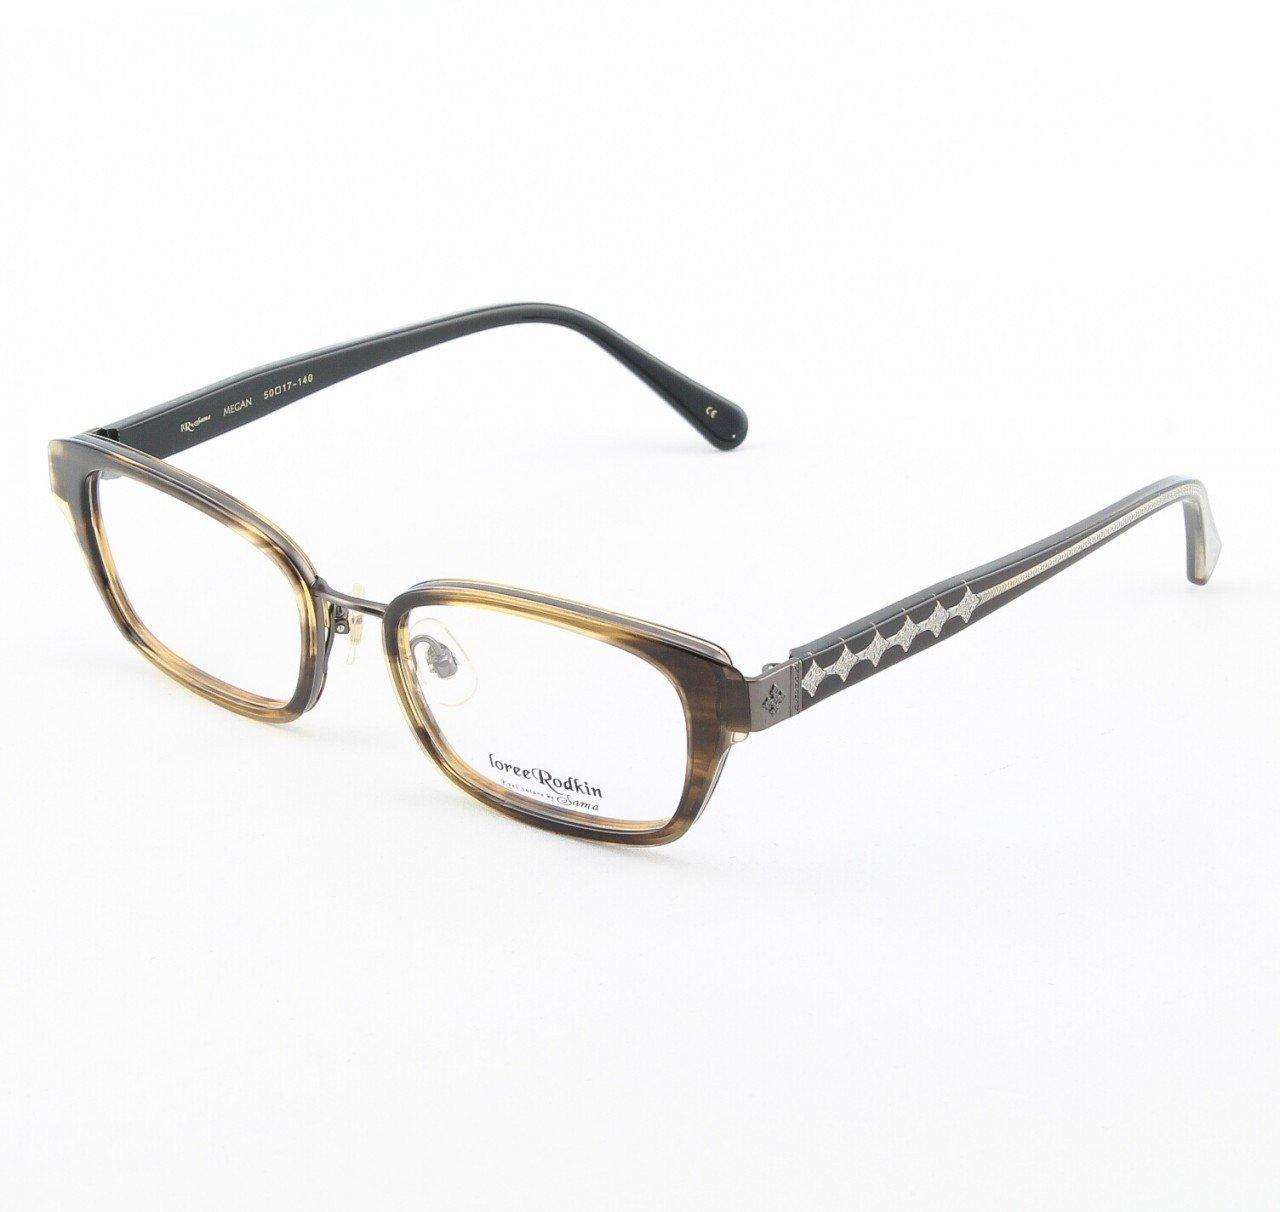 Loree Rodkin Megan Eyeglasses Tortoise w/ Clear Lenses, Plastic Inserts and Decorative Temple Core